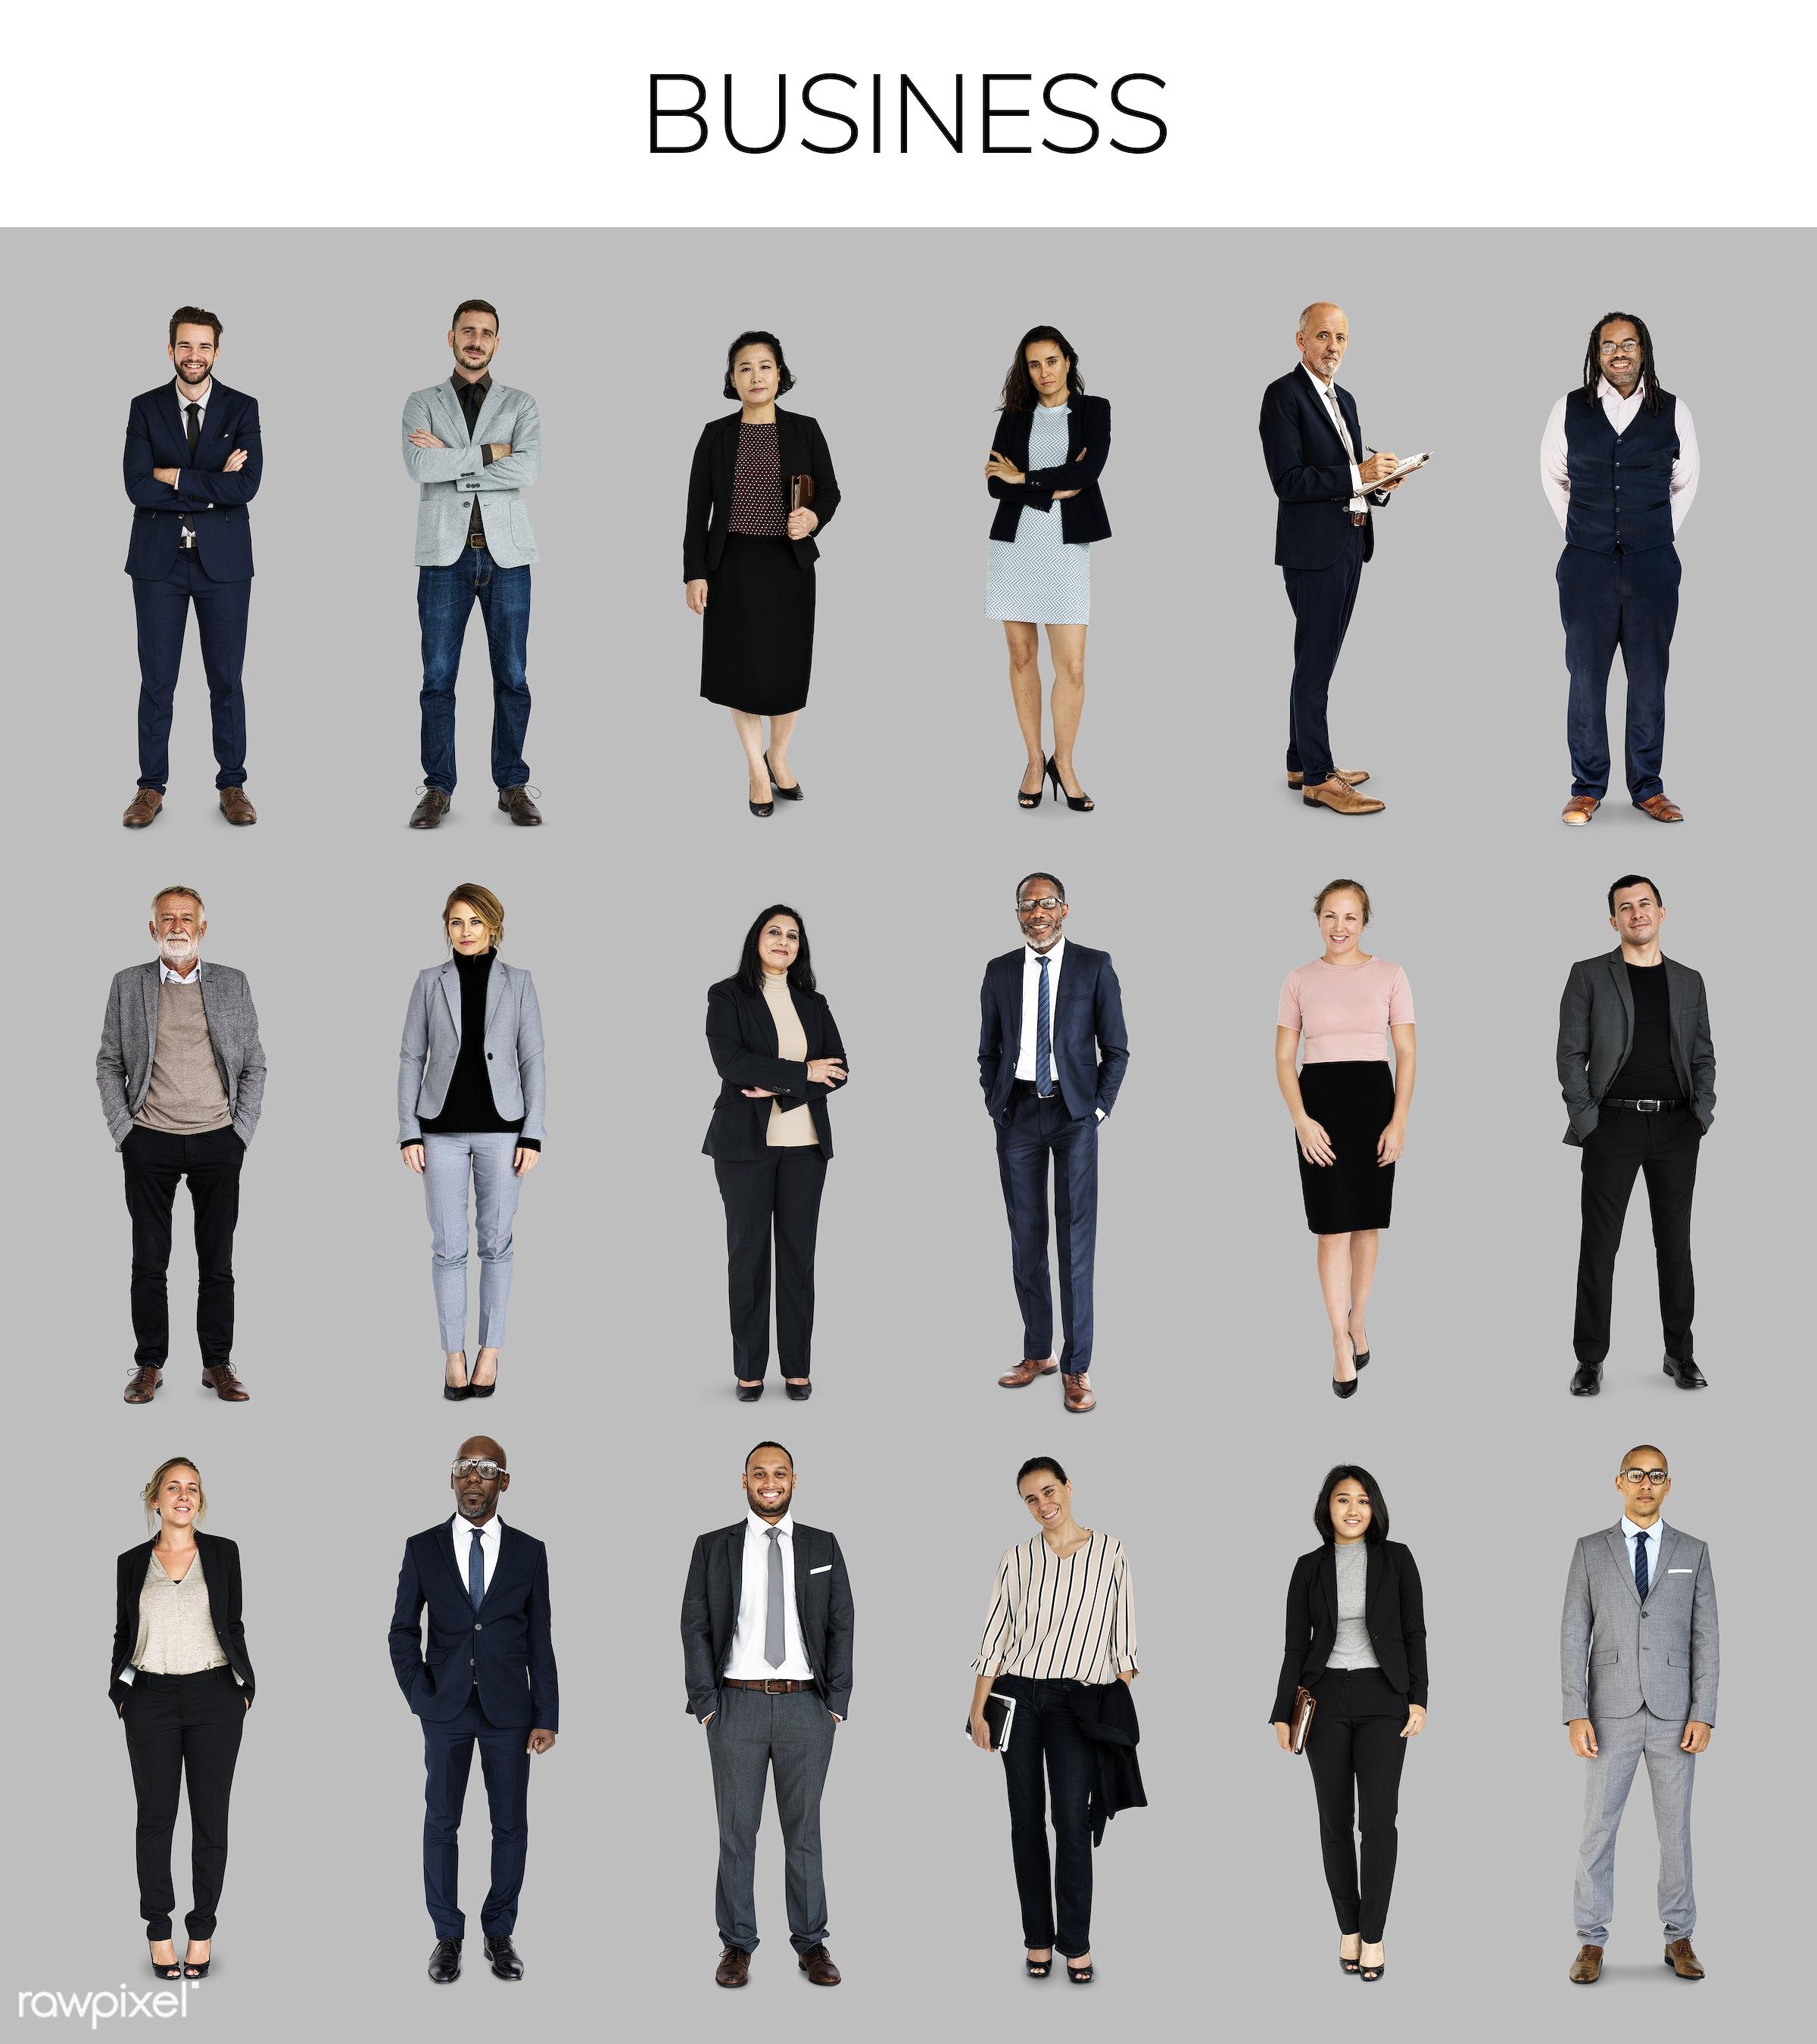 studio, manager, full length, diverse, profession, people, caucasian, assistant, lifestyle, studio squareset, occupation,...